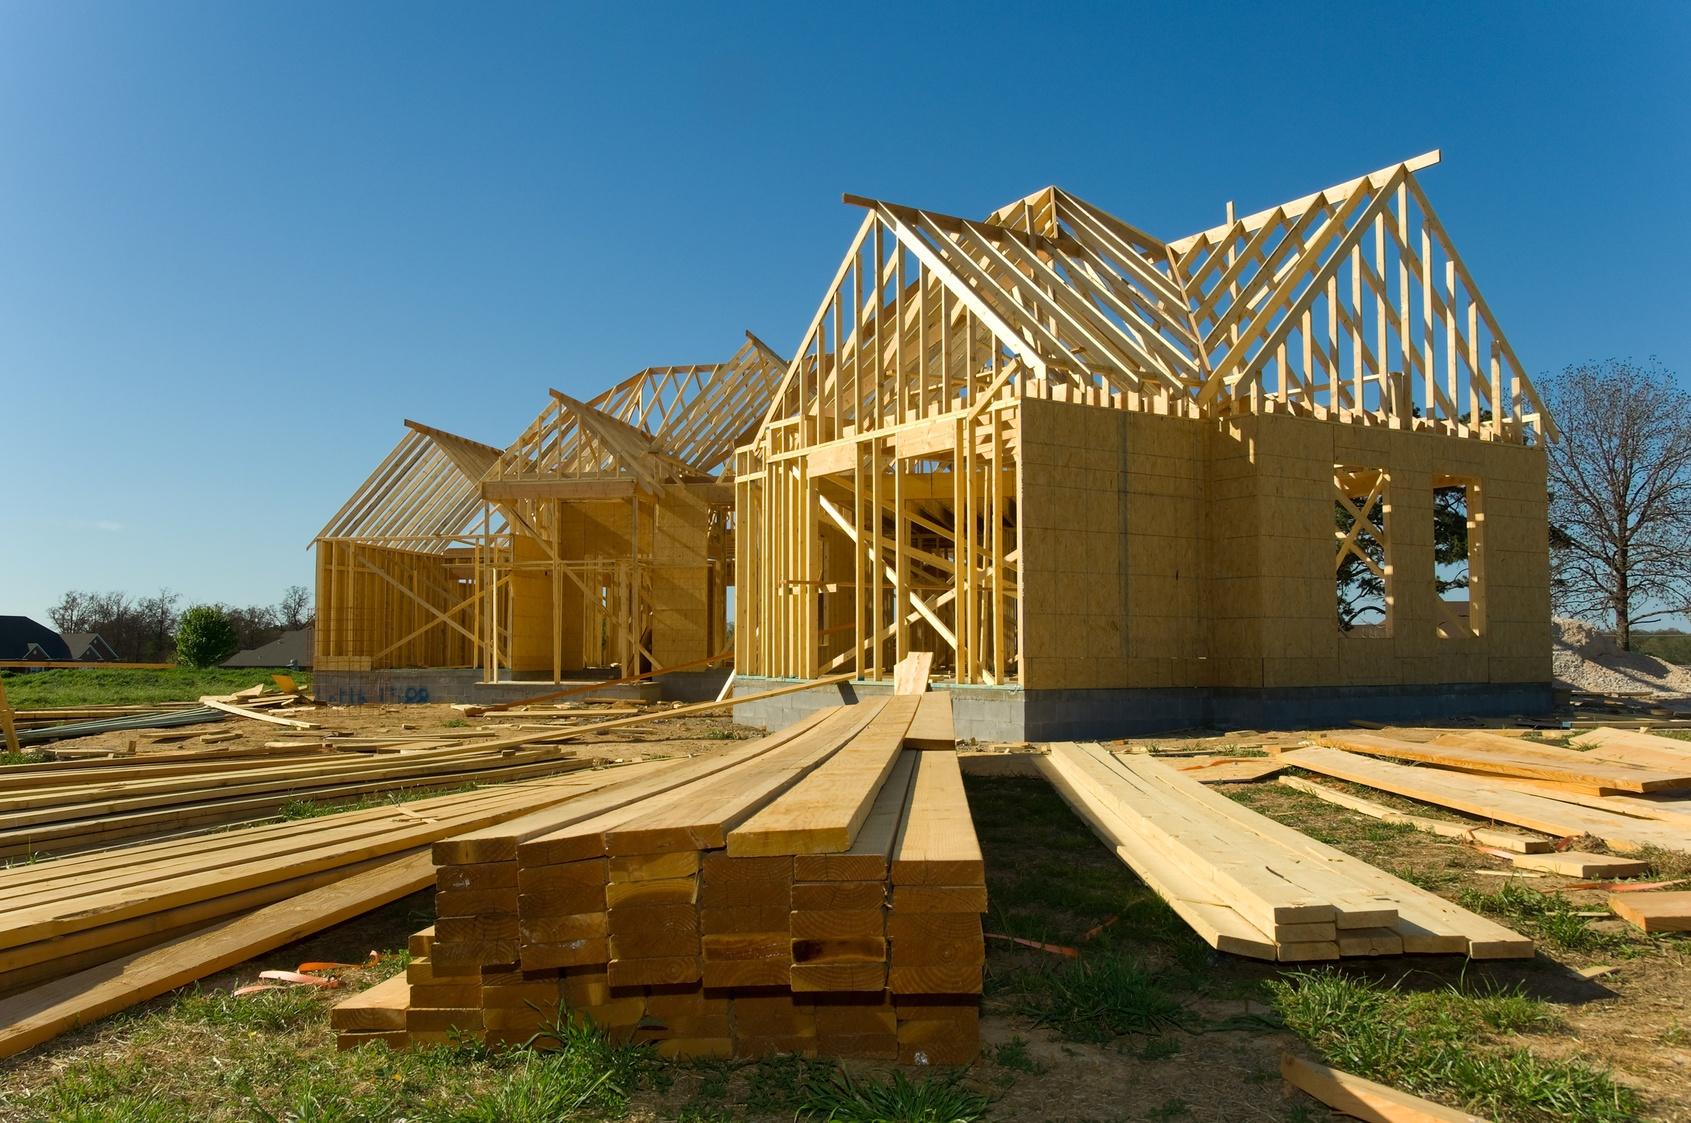 A residential development is framed